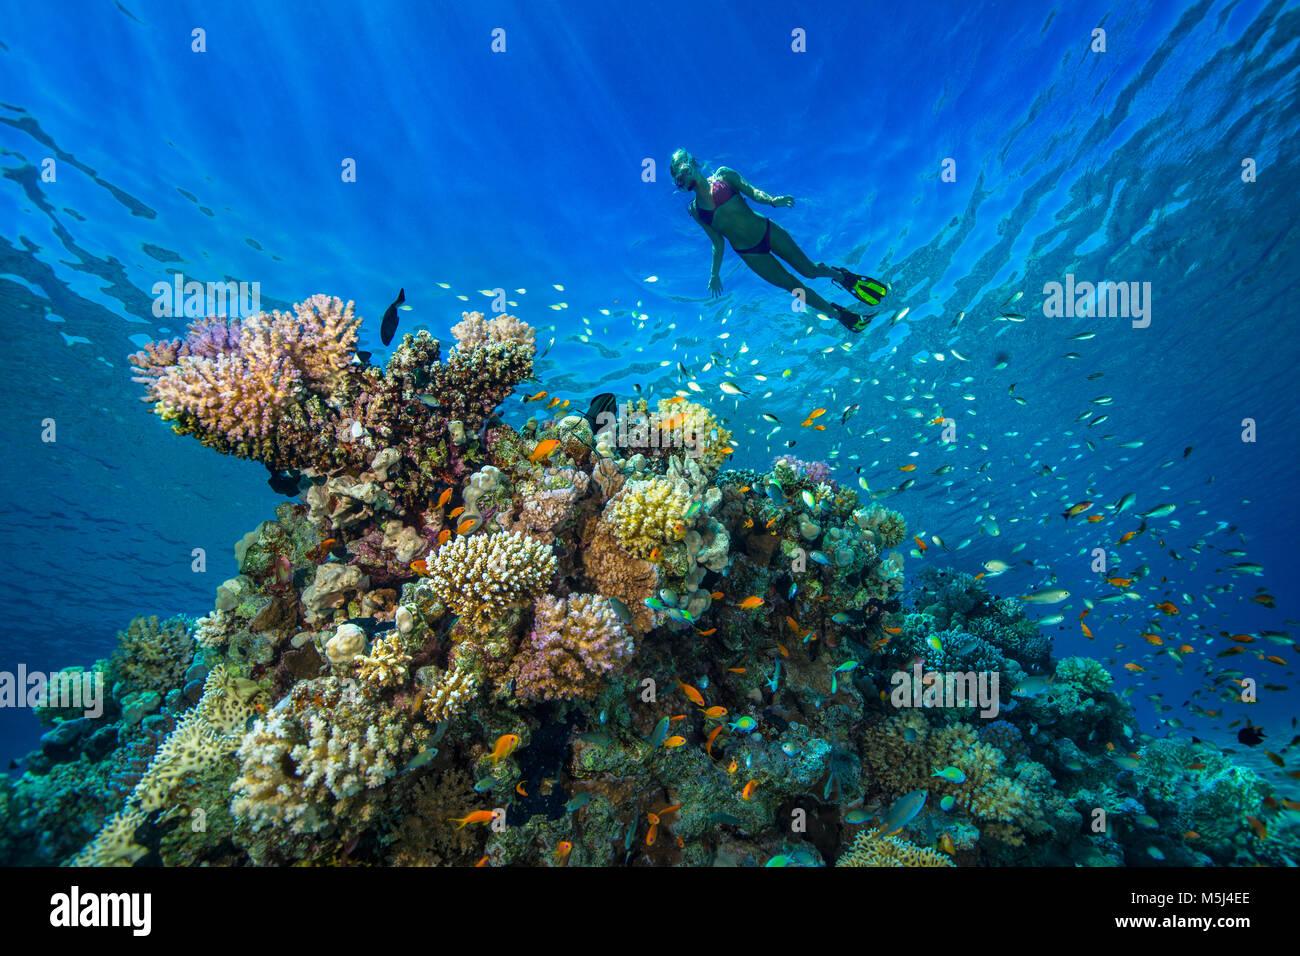 Ägypten, Rotes Meer, Hurghada, junge Frau Schnorcheln am Korallenriff Stockbild